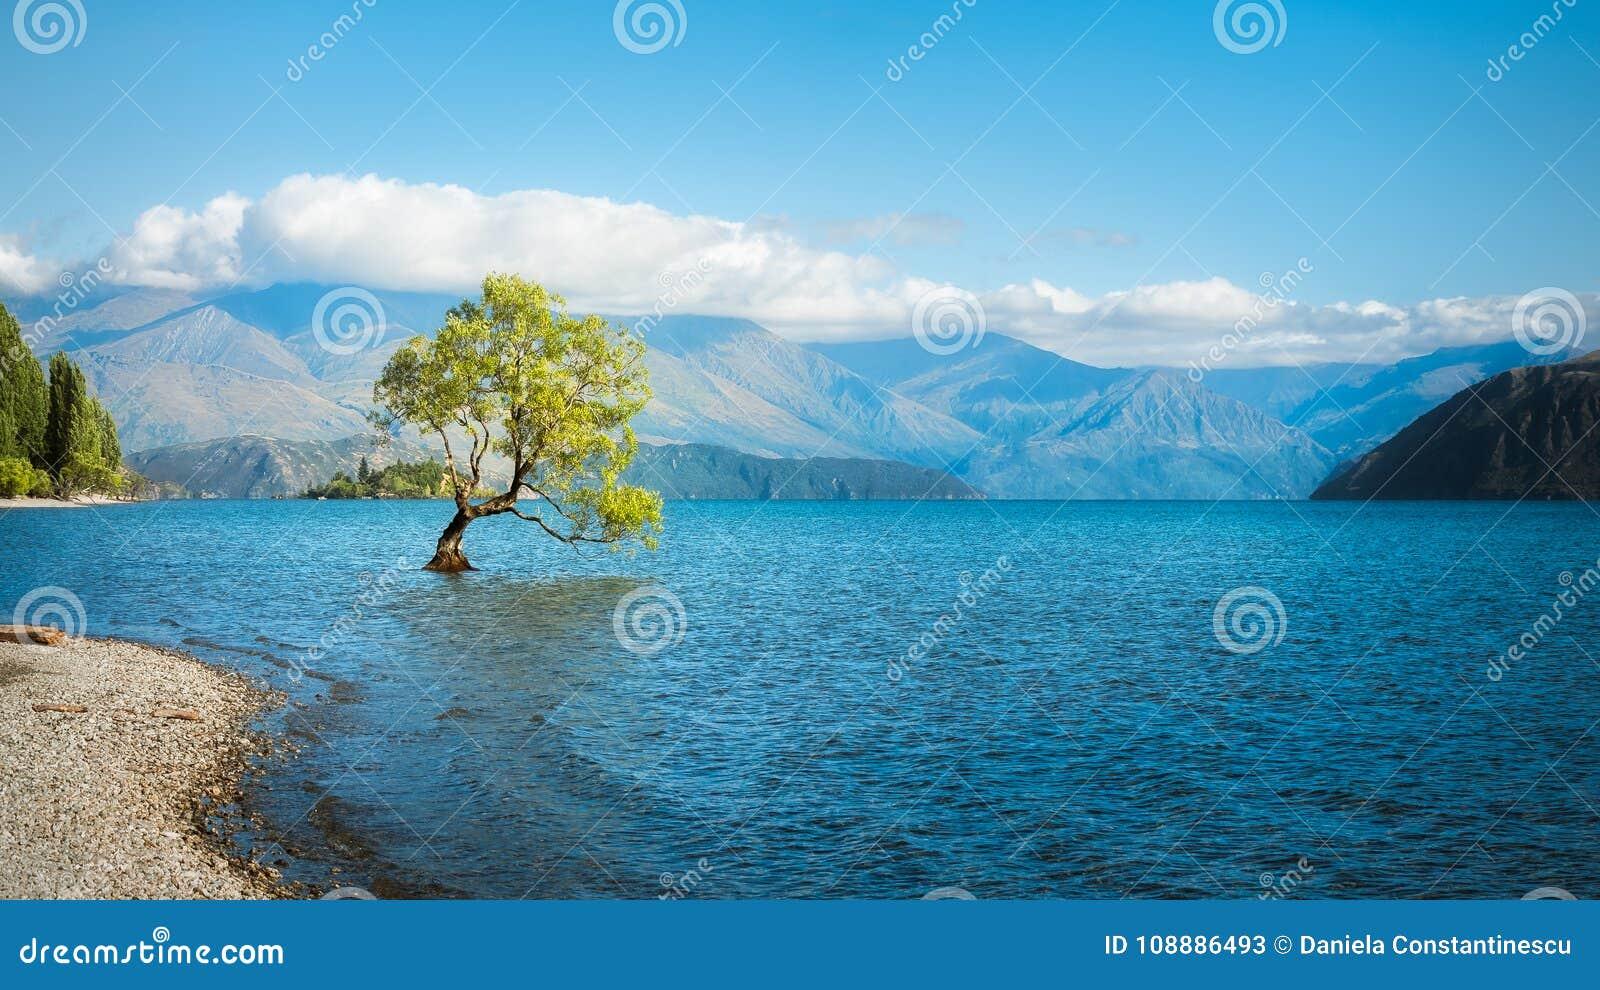 A Symbolic Willow Tree at Lake Wanaka.